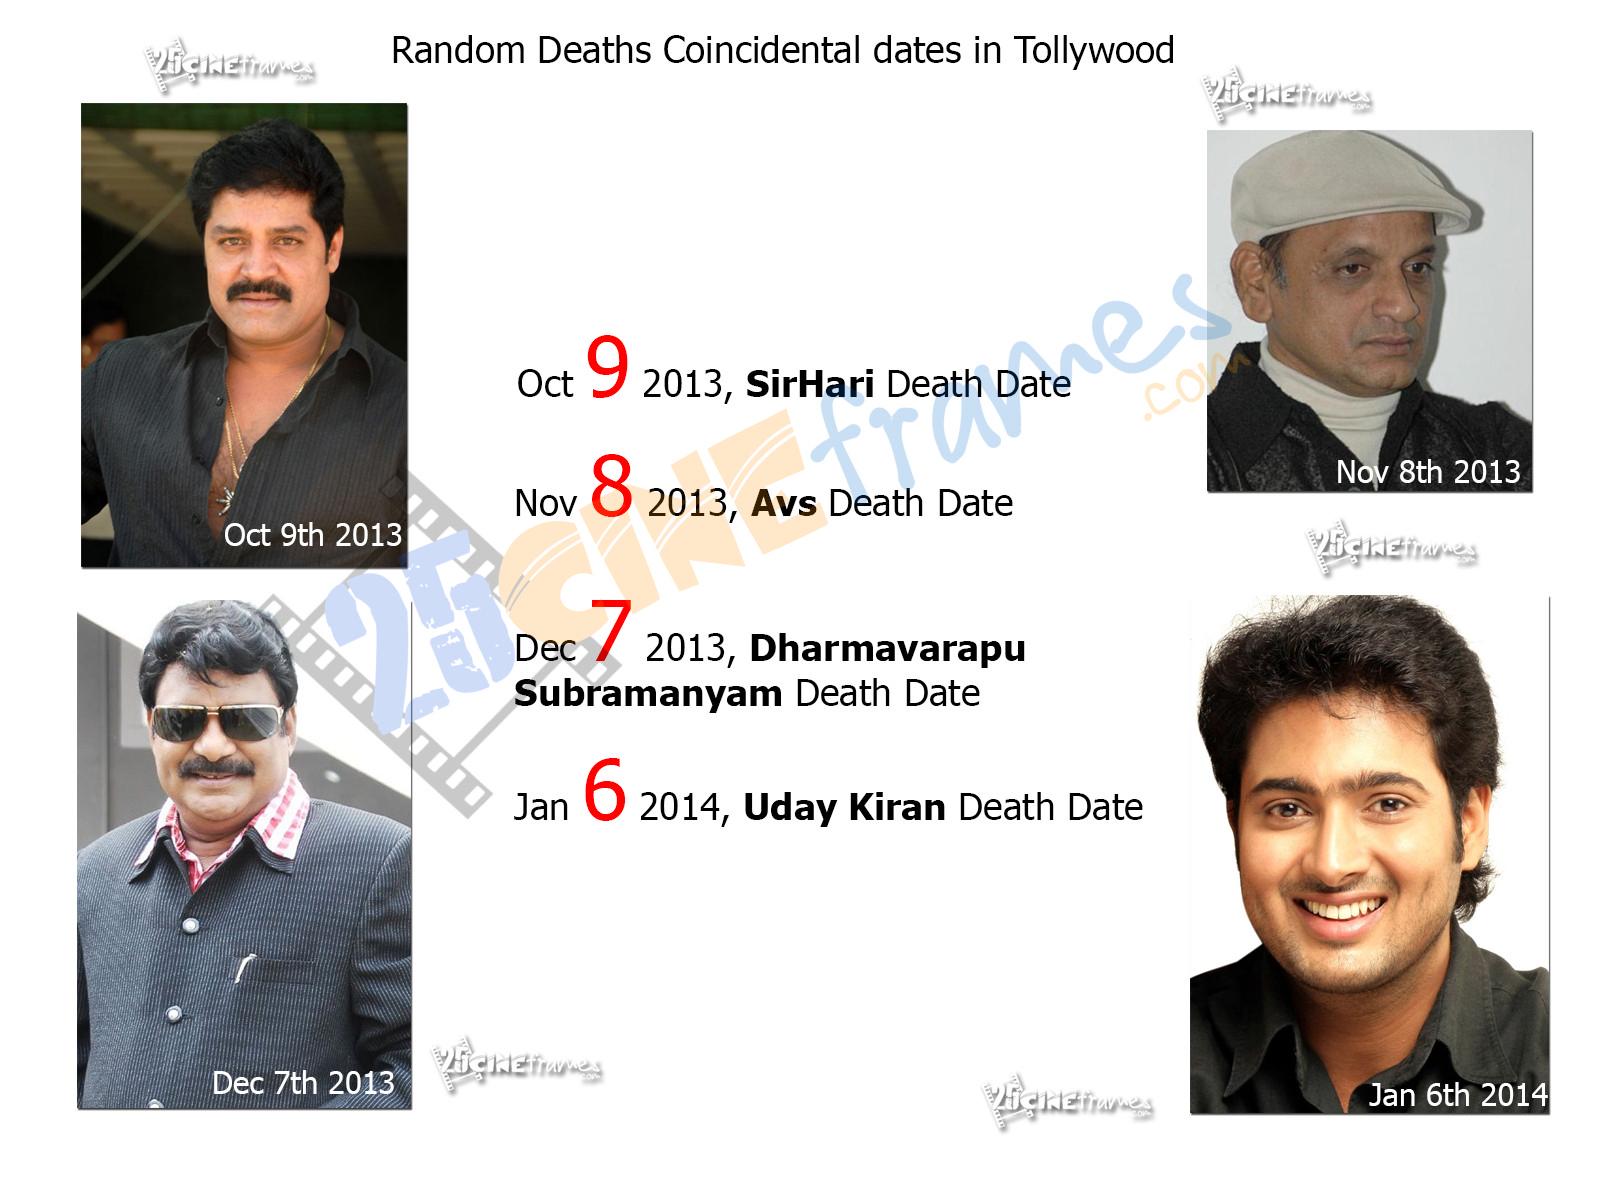 Random Deaths Coincidental dates in Tollywood   25CineFrames Uday Kiran Death Date